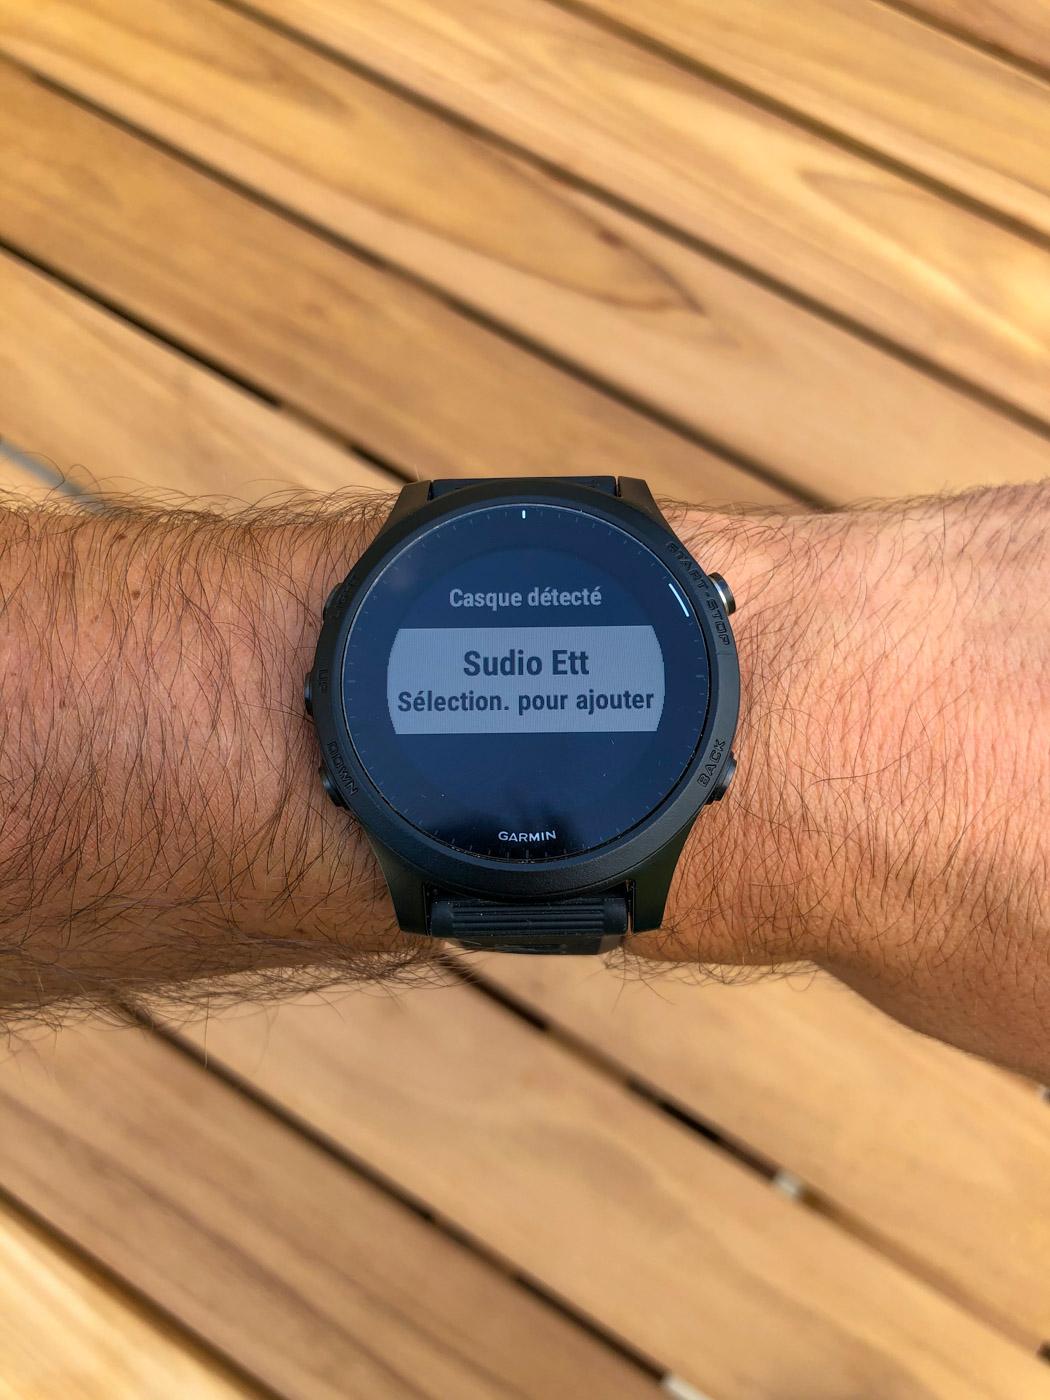 Couplage montre Garmin Forerunner avec écouteurs Sudio ETT